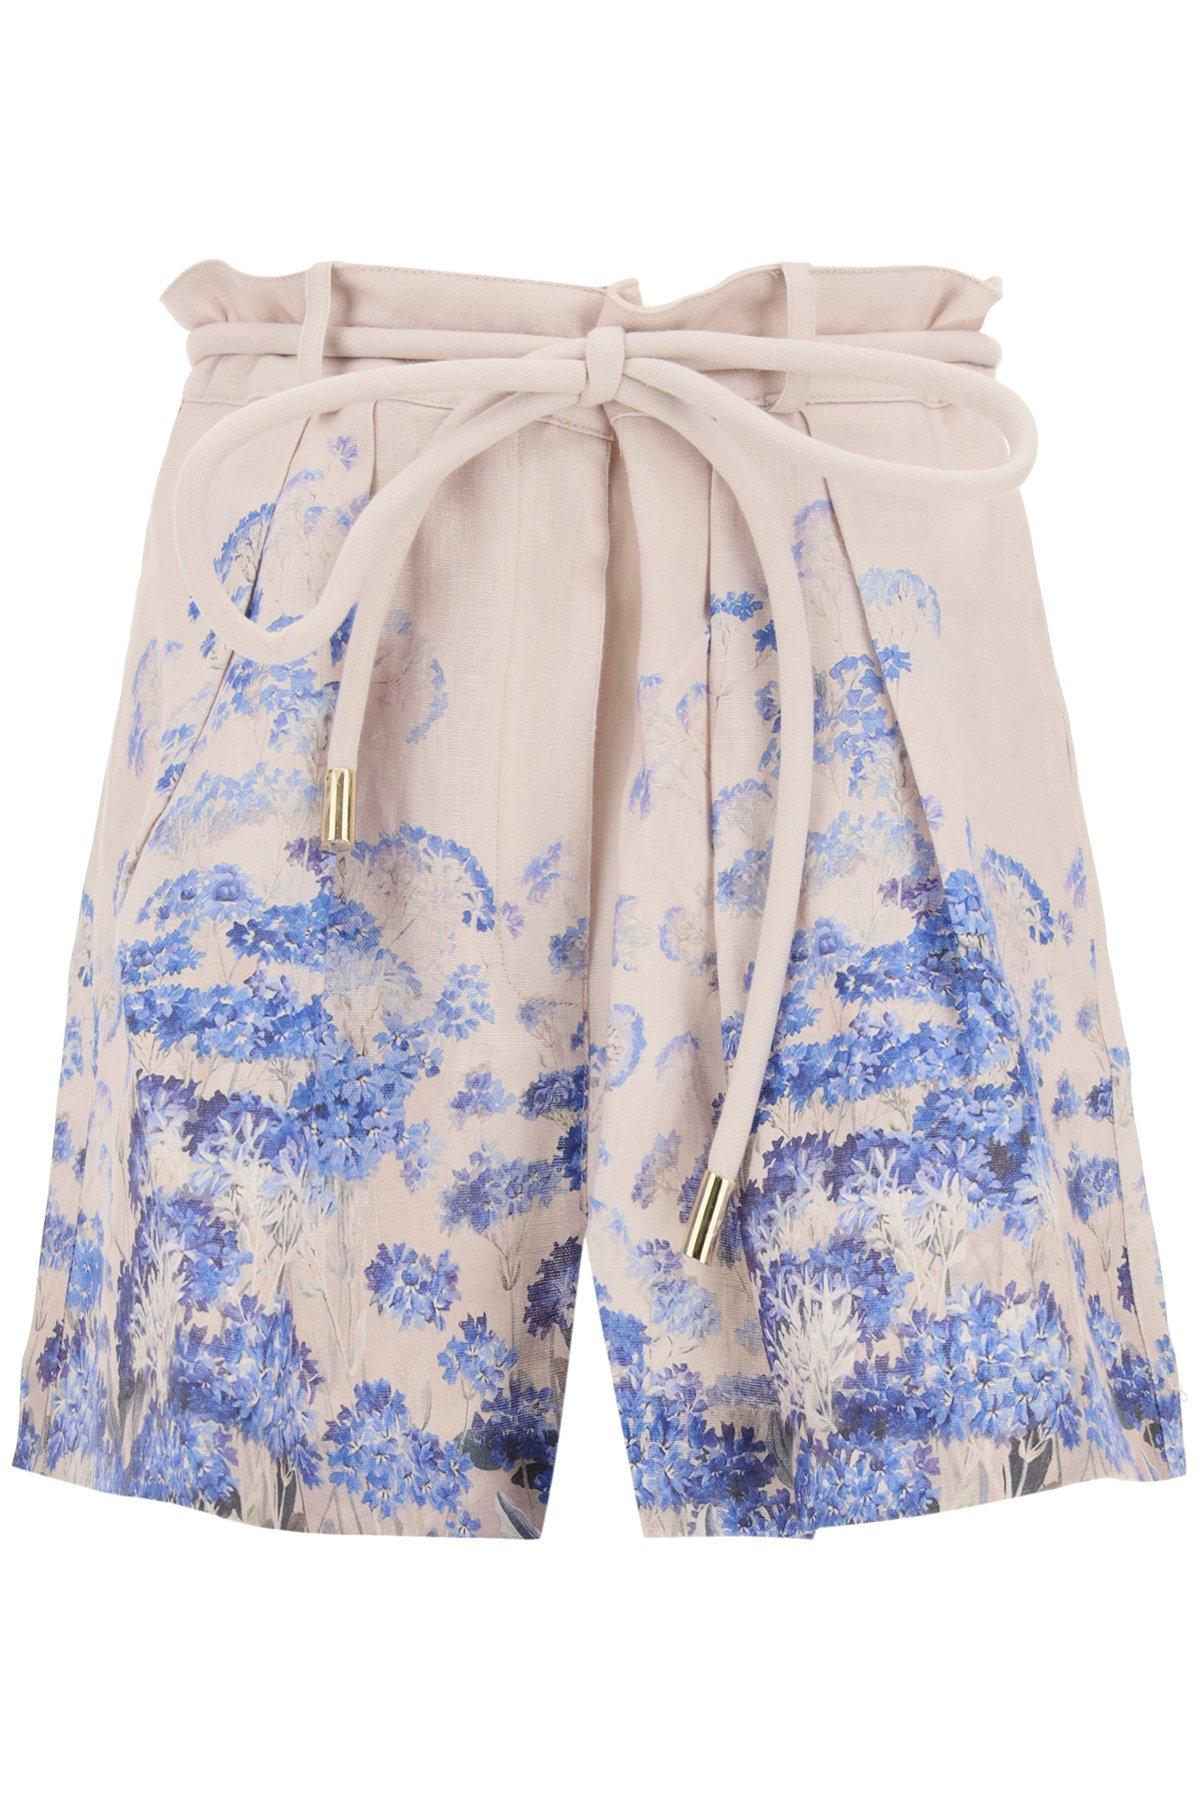 Zimmermann shorts luminous in lino